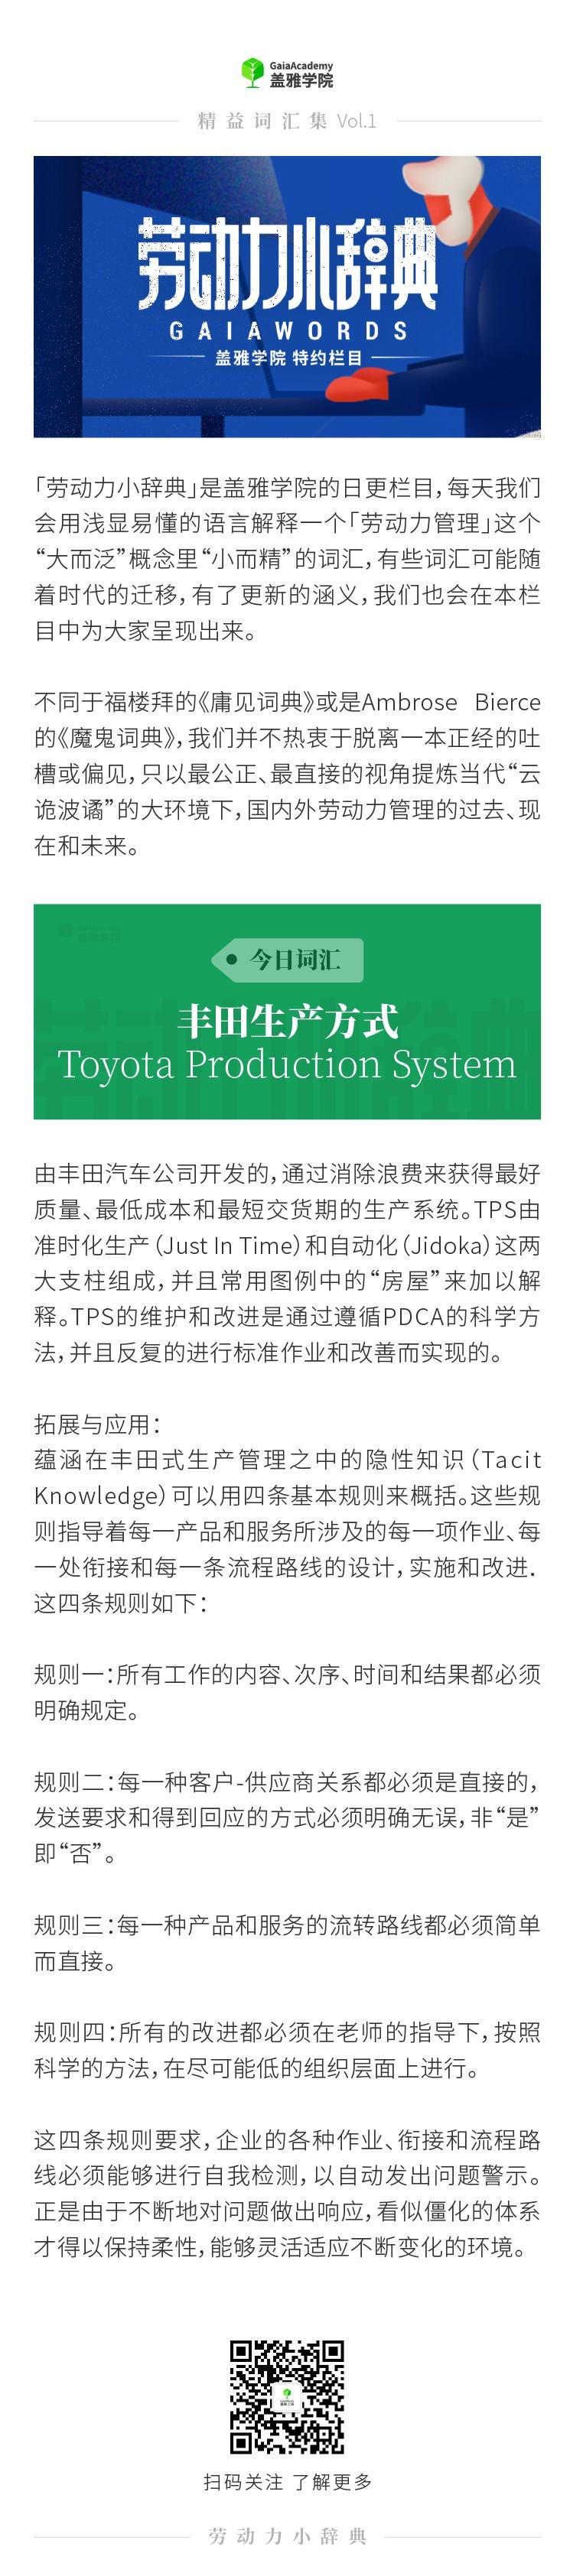 丰田生产方式 Toyota Production System